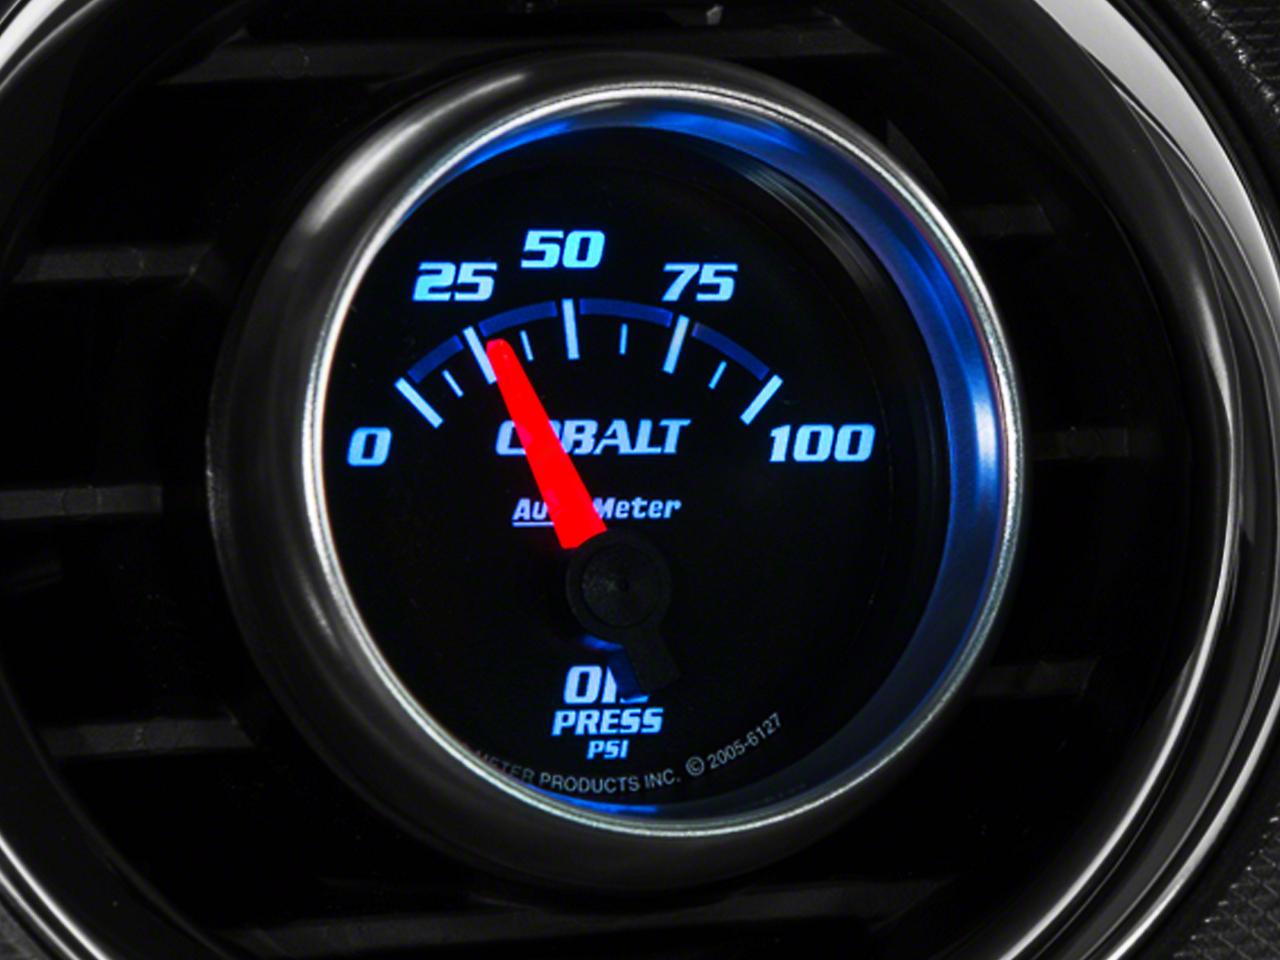 Auto Meter Cobalt Oil Pressure Gauge - Electric (79-14 All)